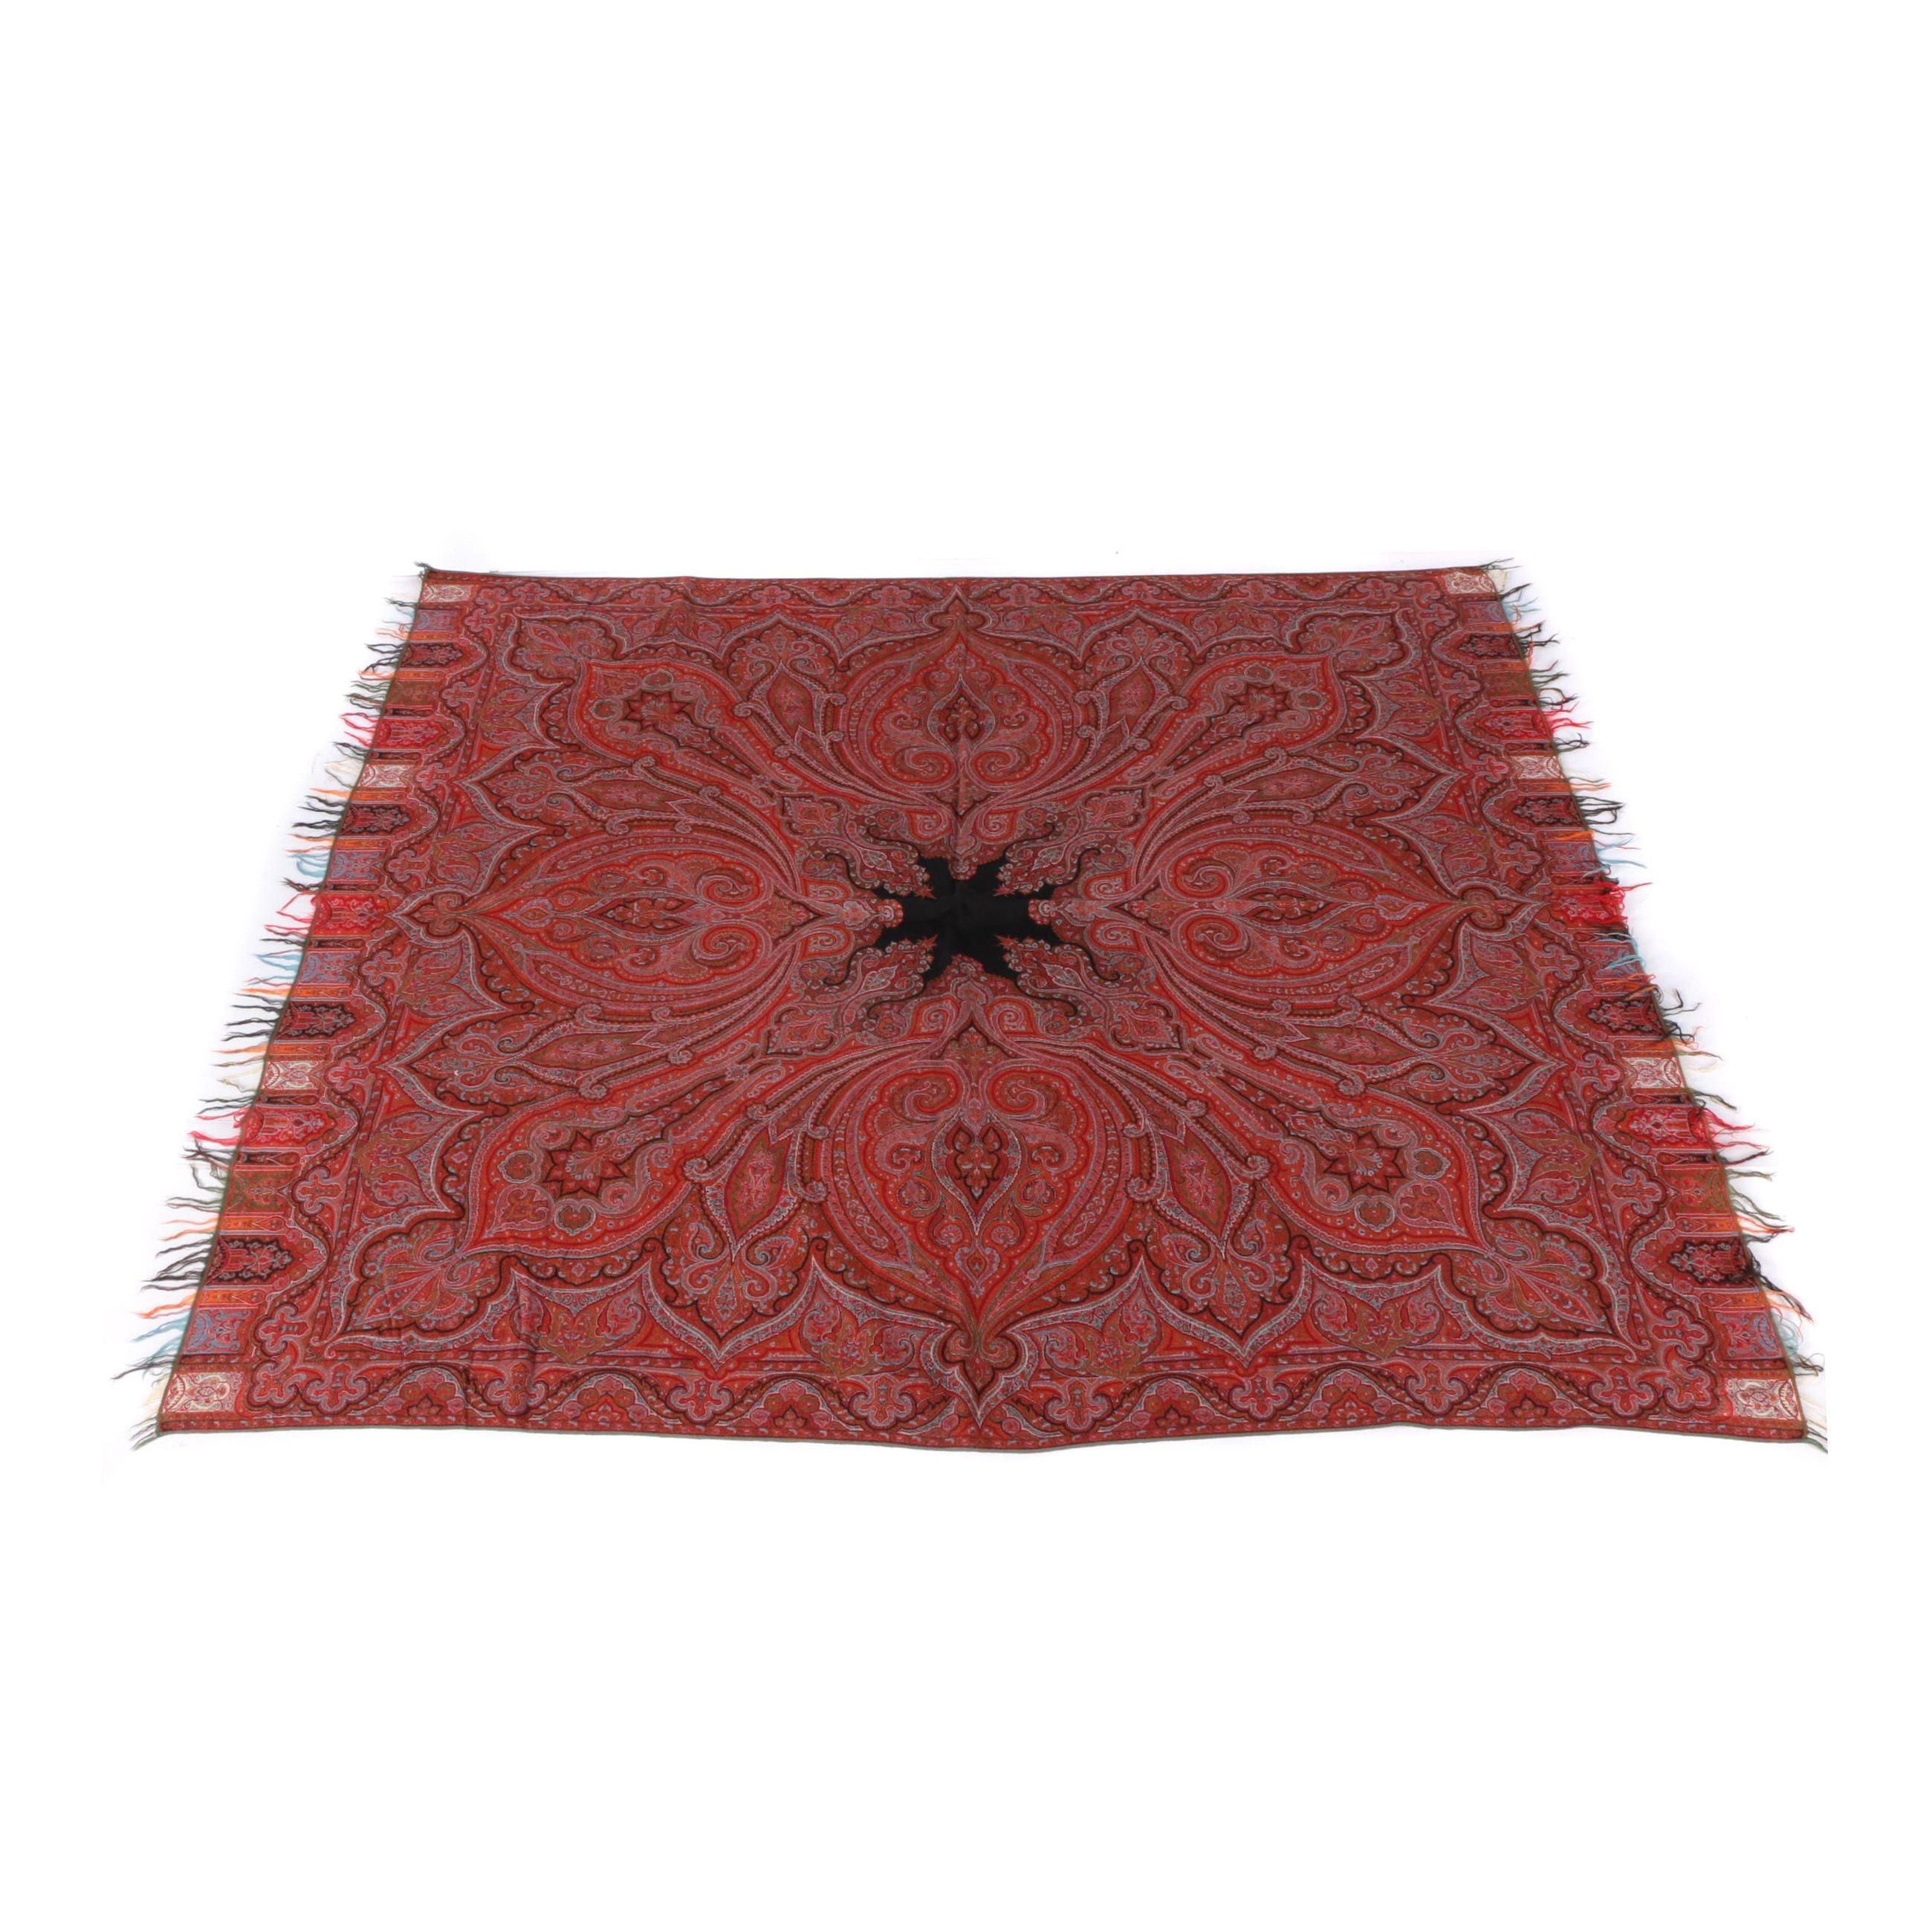 1800s European Woven Wool Paisley Shawl